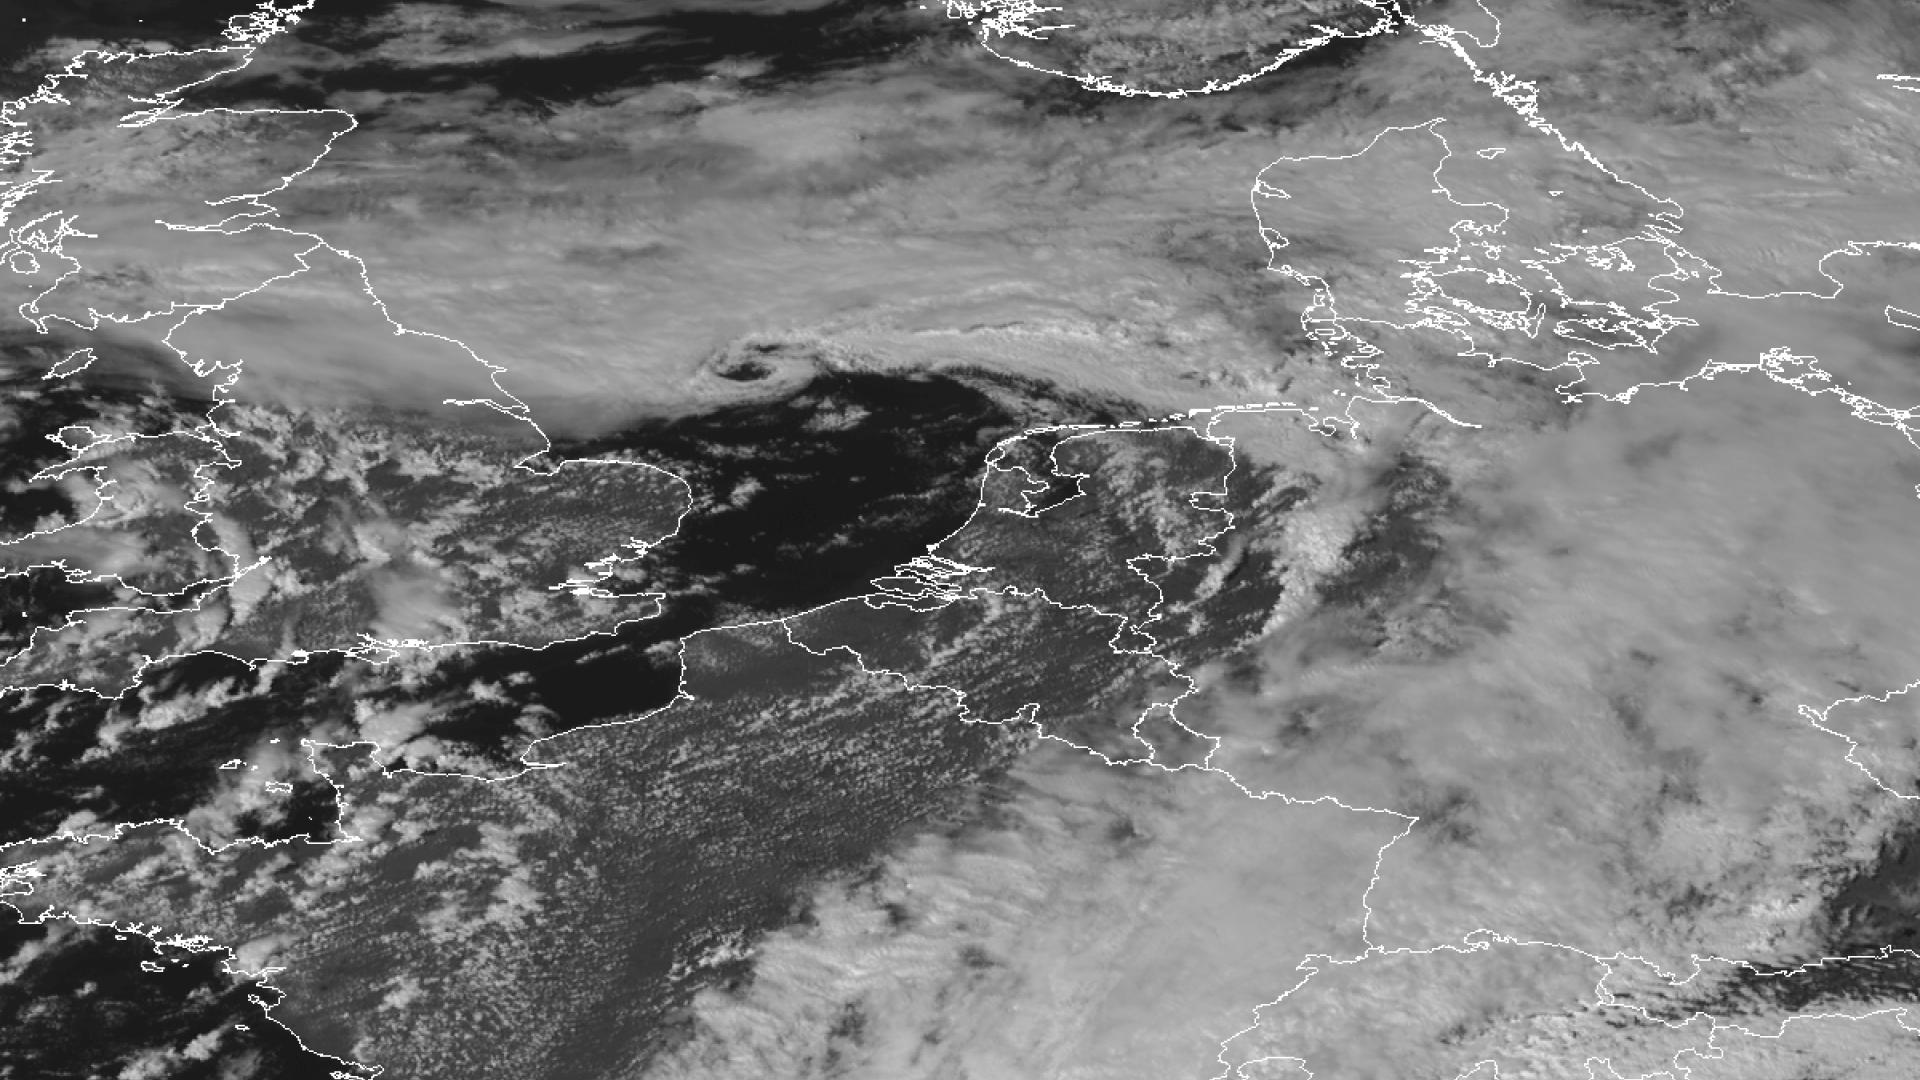 North Sea mini cloud vortex